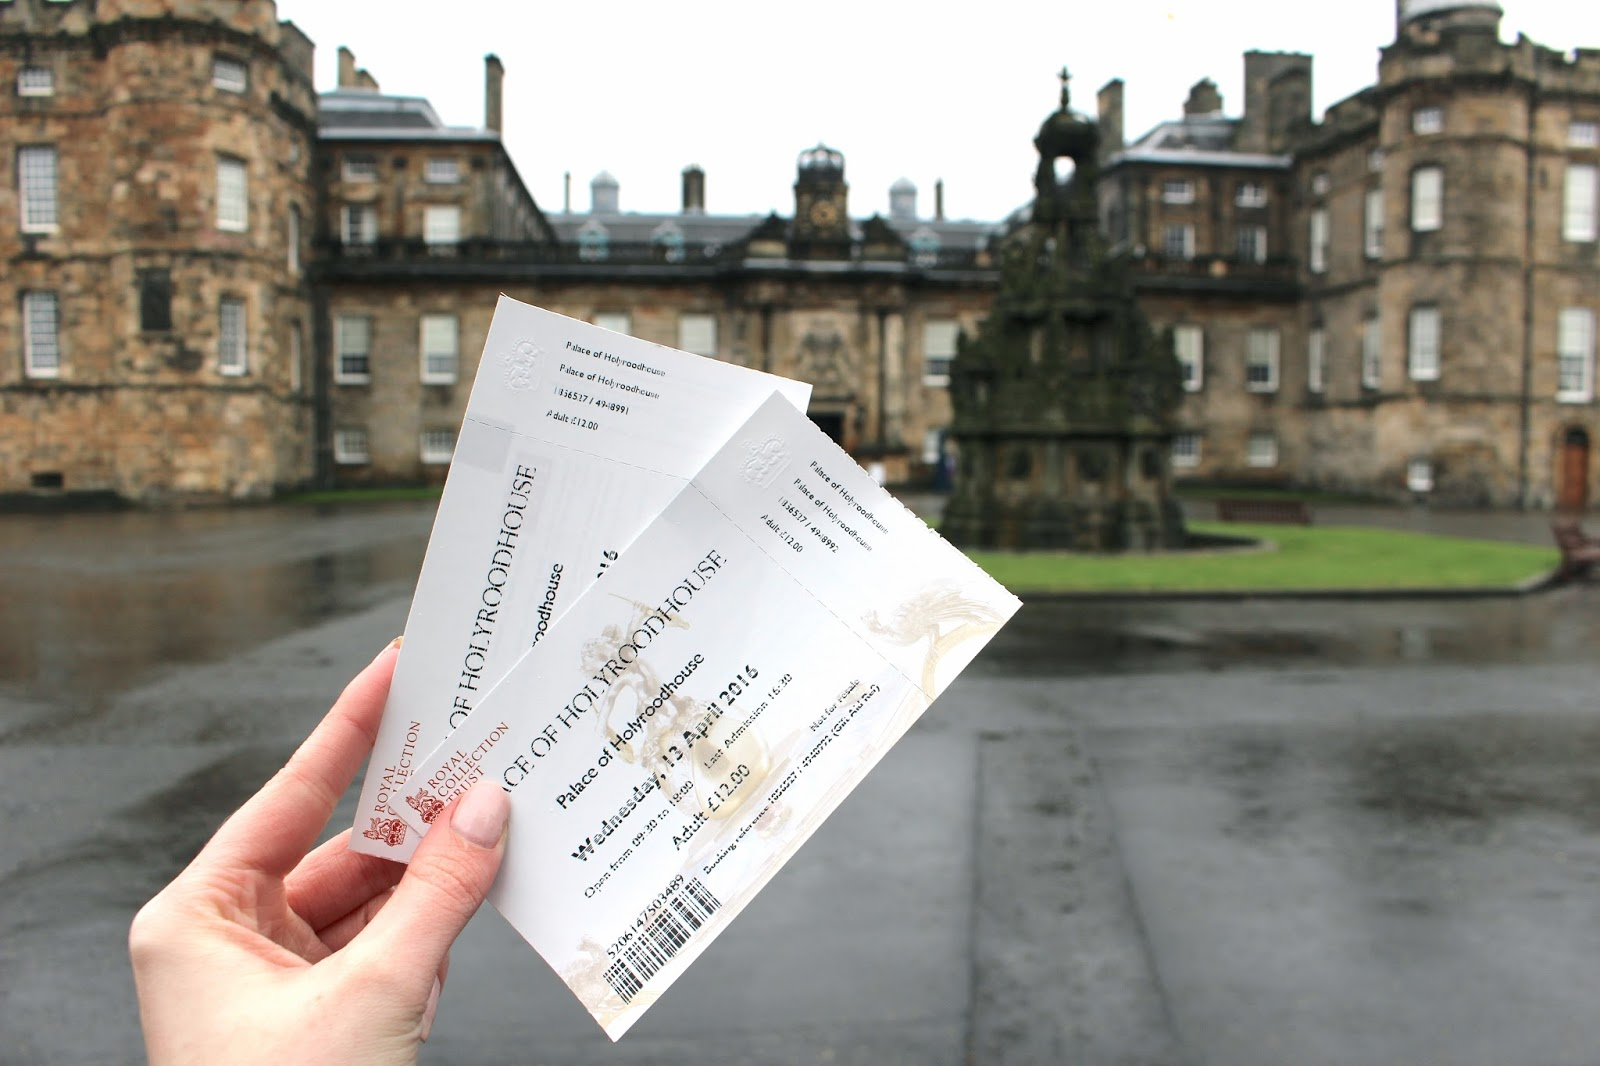 Holyrood Palace travel blog review